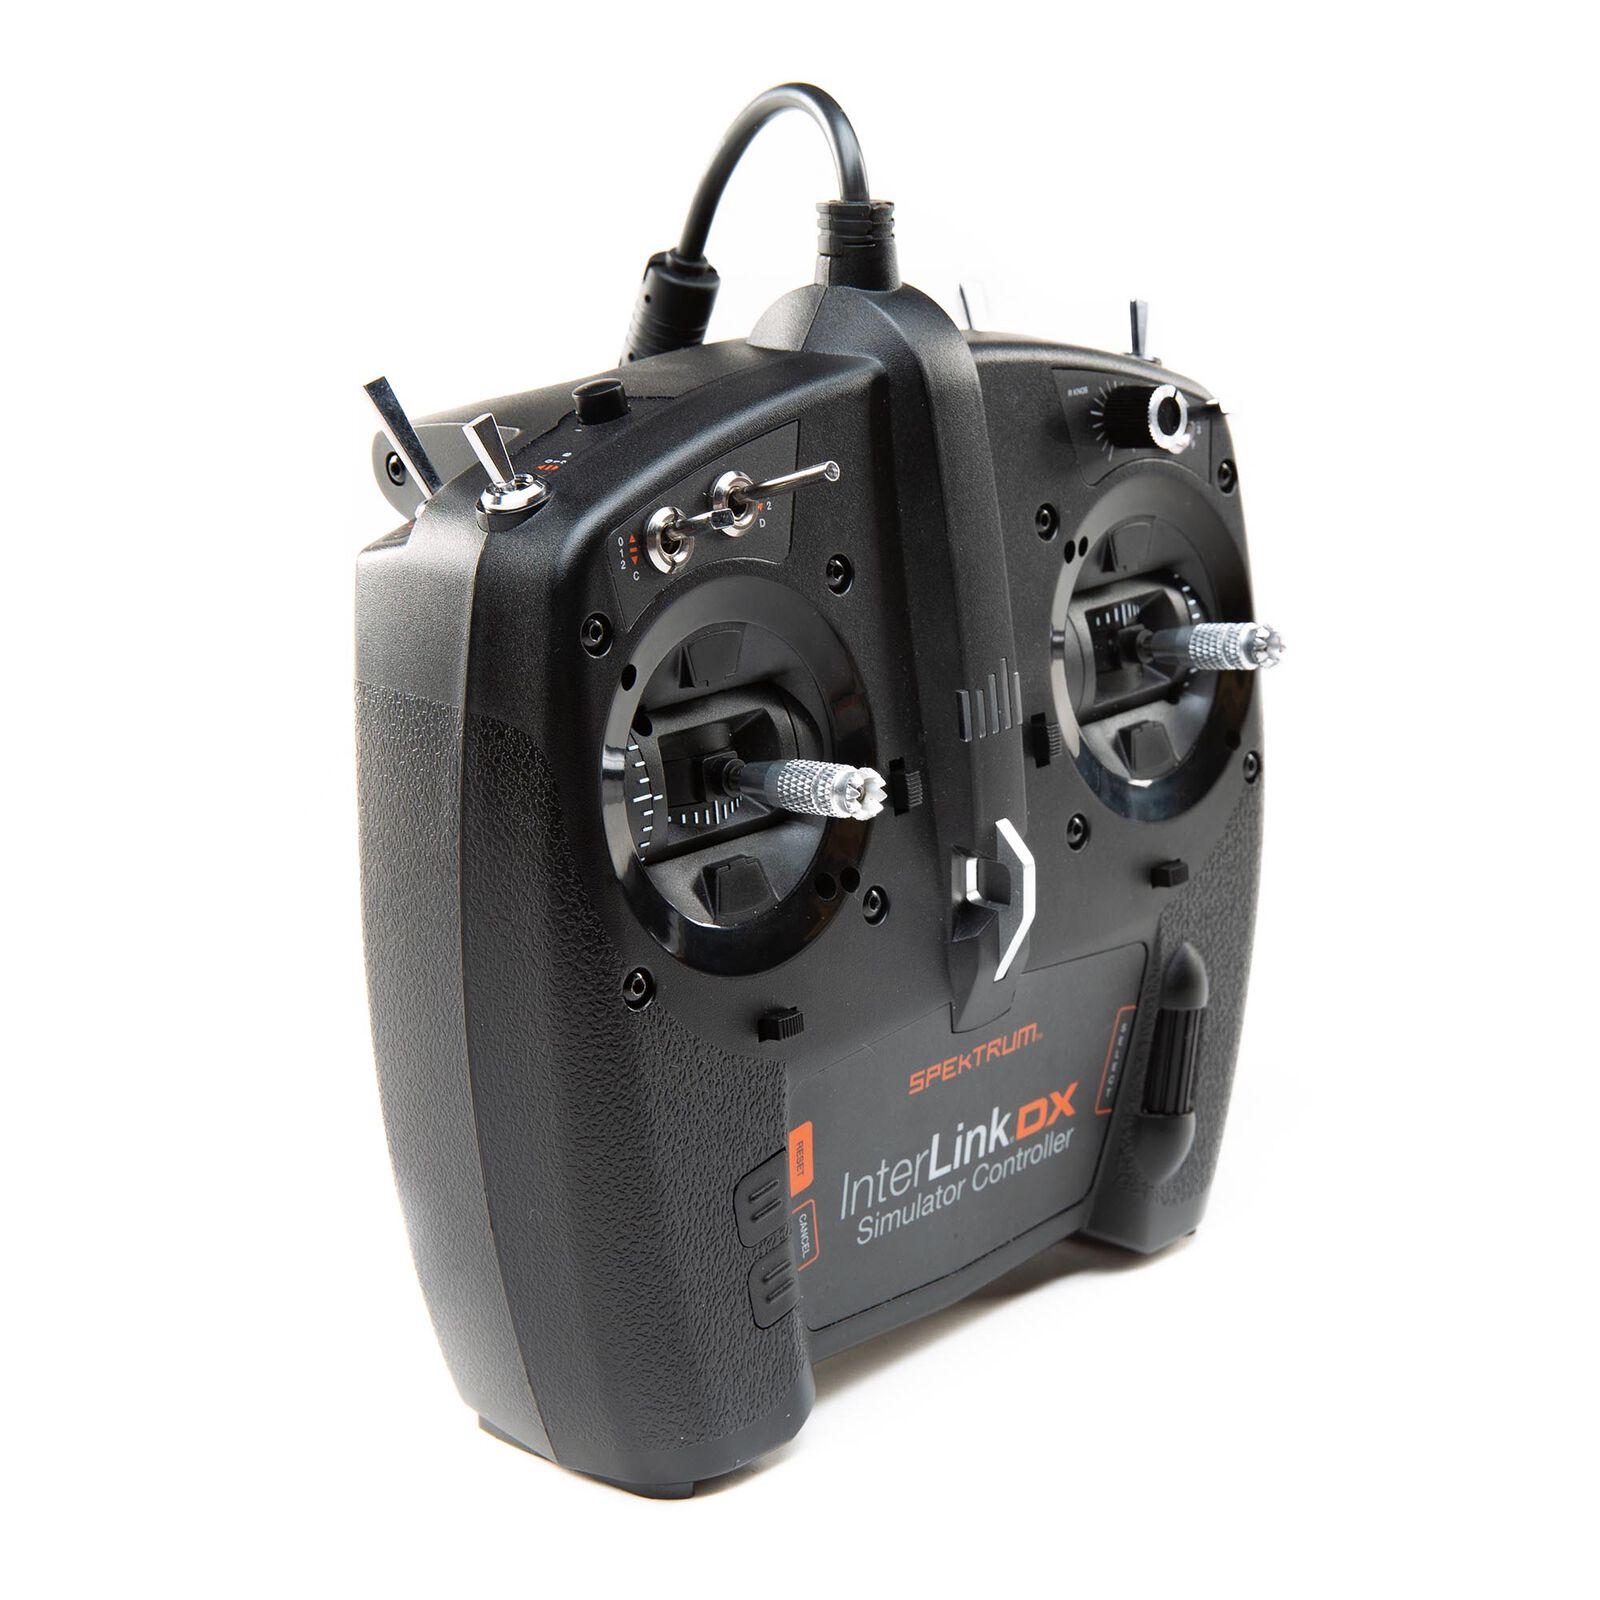 InterLink DX Simulator Controller with USB Plug